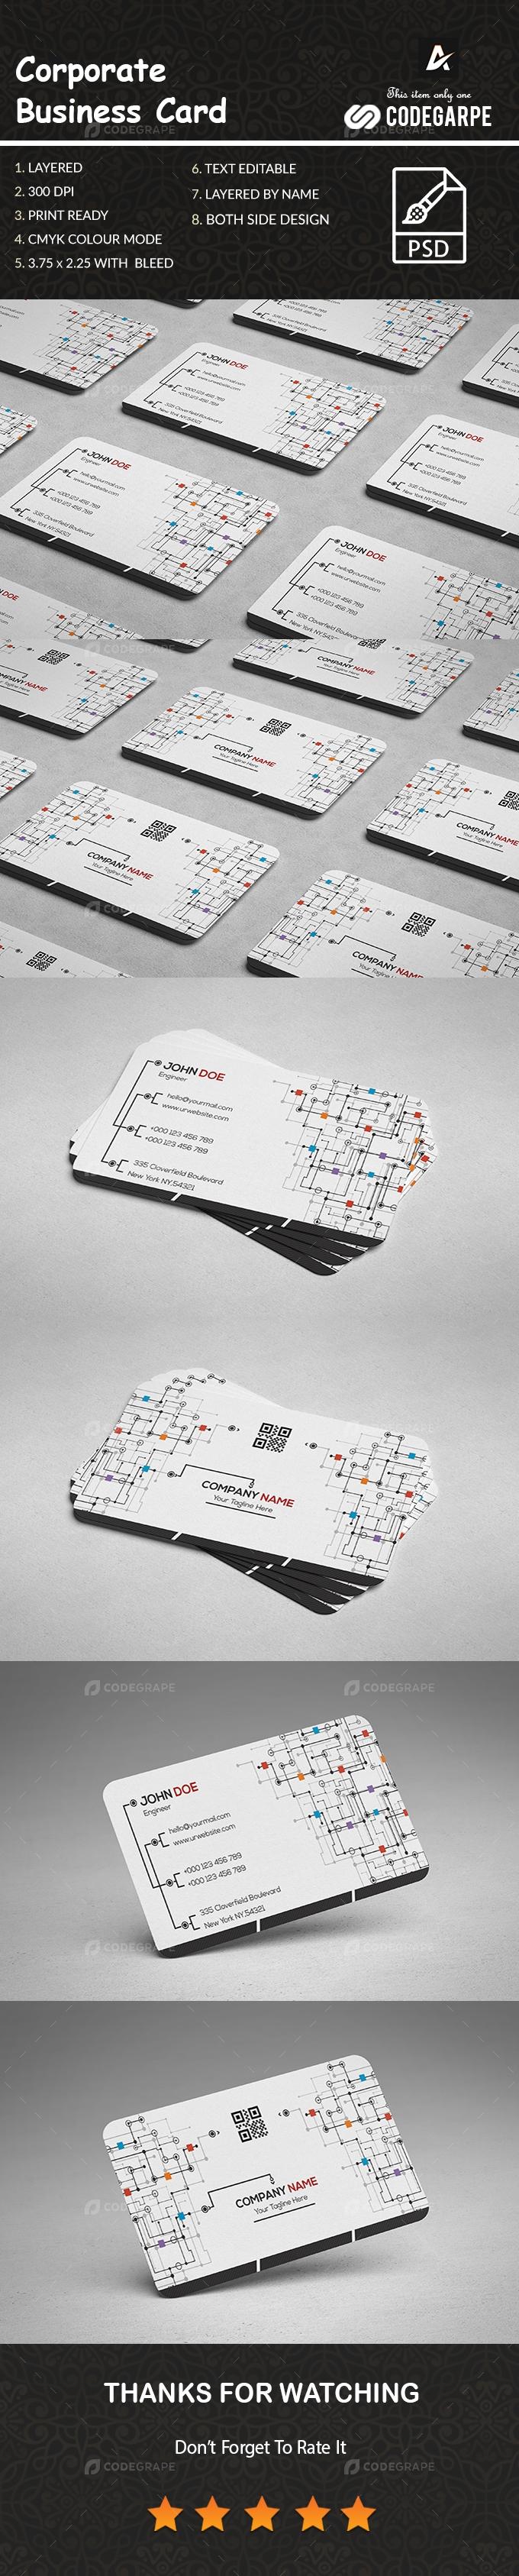 Corporate Business Card [VOL-6]